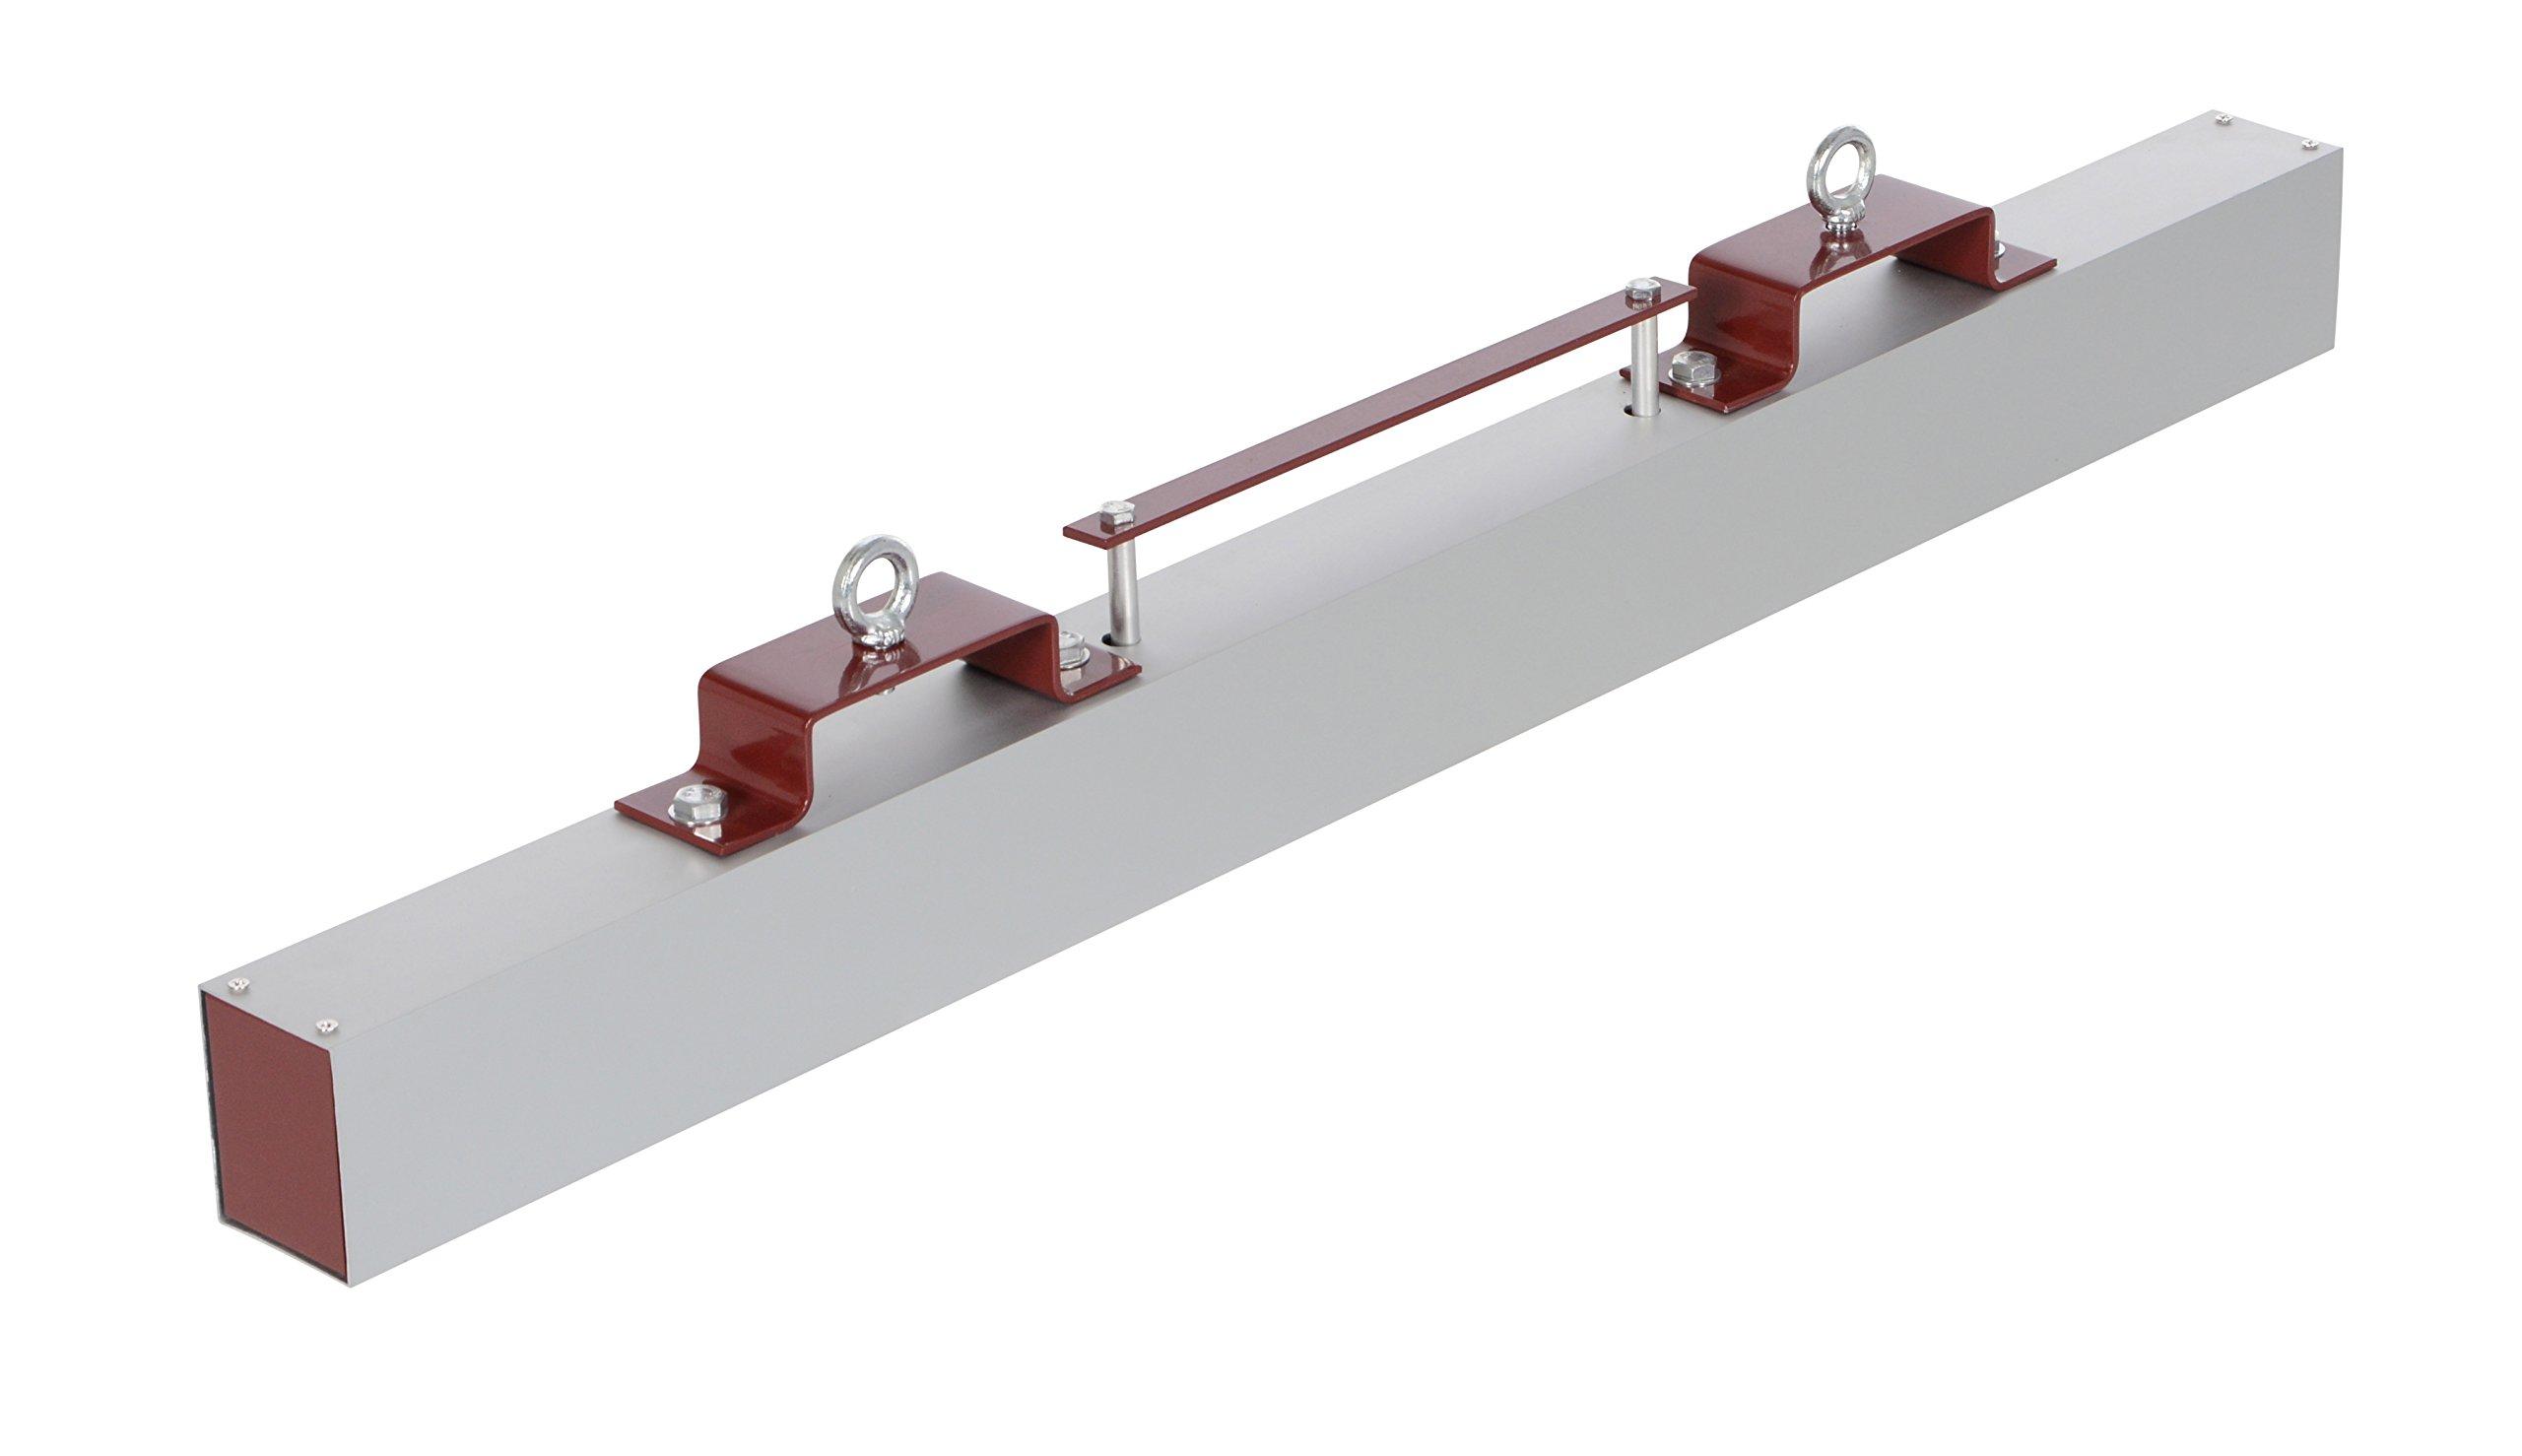 Vestil HFMS-48 Magnetic Sweeper Forklift Hanger, Release Lever, 5'' x 1-1/4'' Fork Pockets, Overall Dimensions 3'' Length x 48'' Width x 7'' Height, 55 lb. Capacity